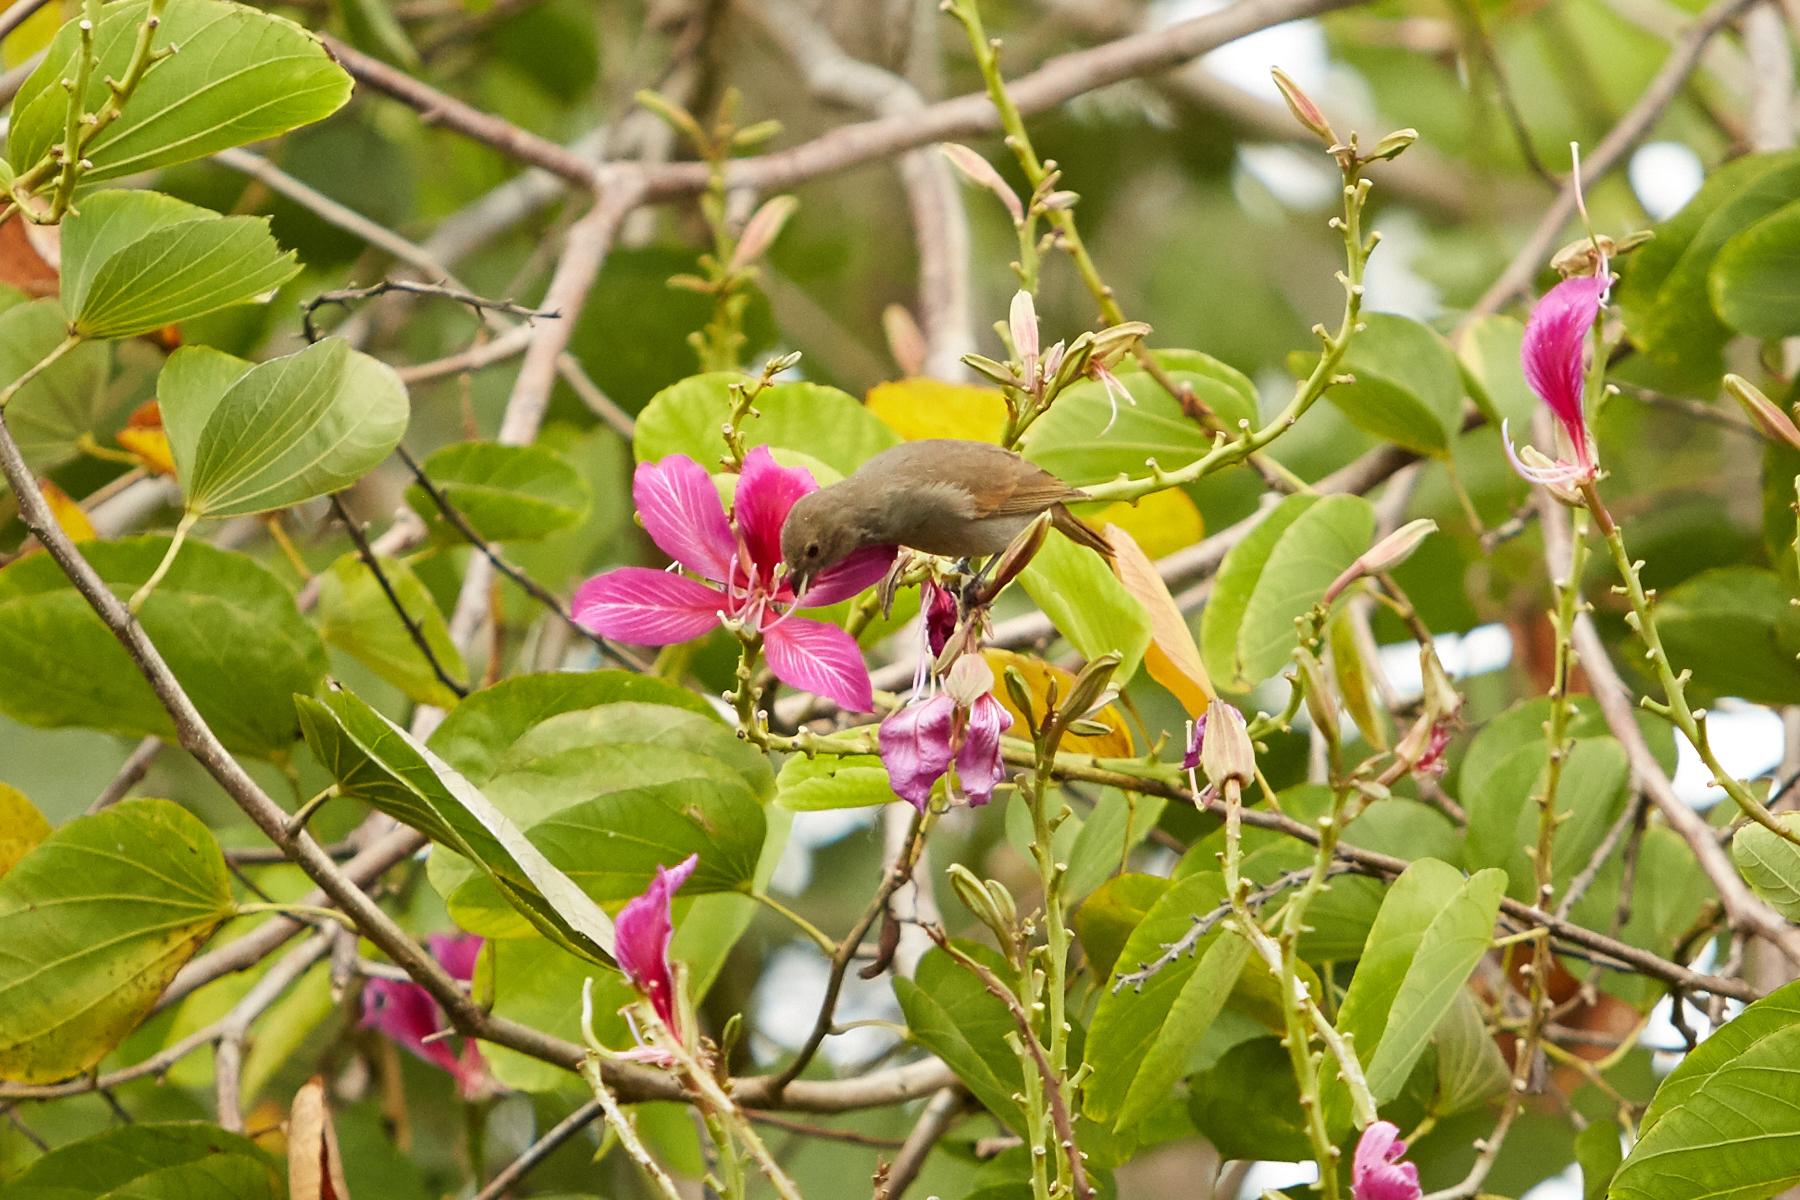 Barbados Bullfinch eating from a flowering tree